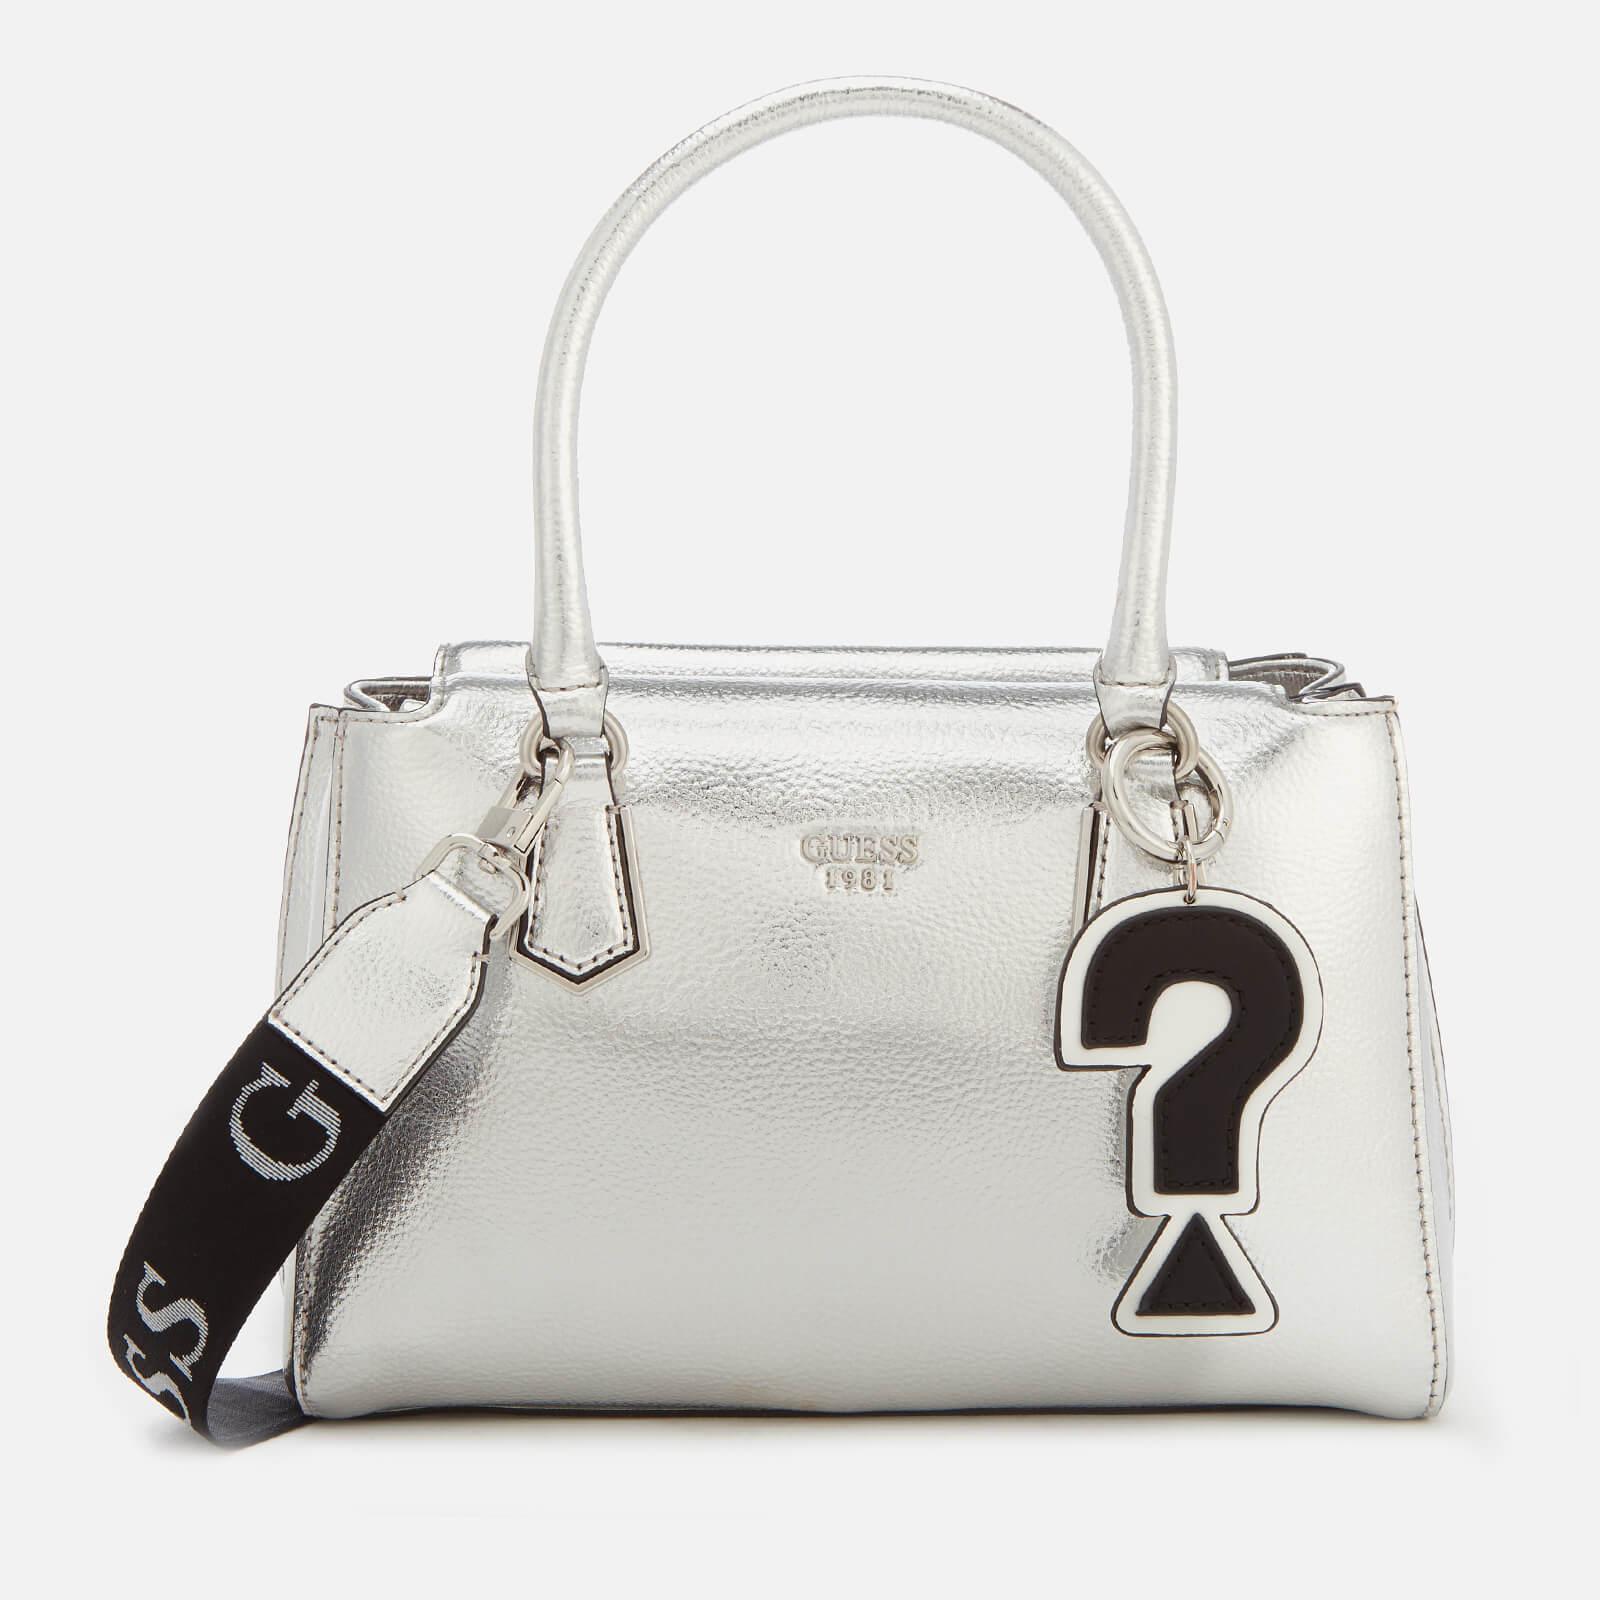 Guess Felix Silver Tote Bag in Metallic - Lyst bcc5c9f3a6e62